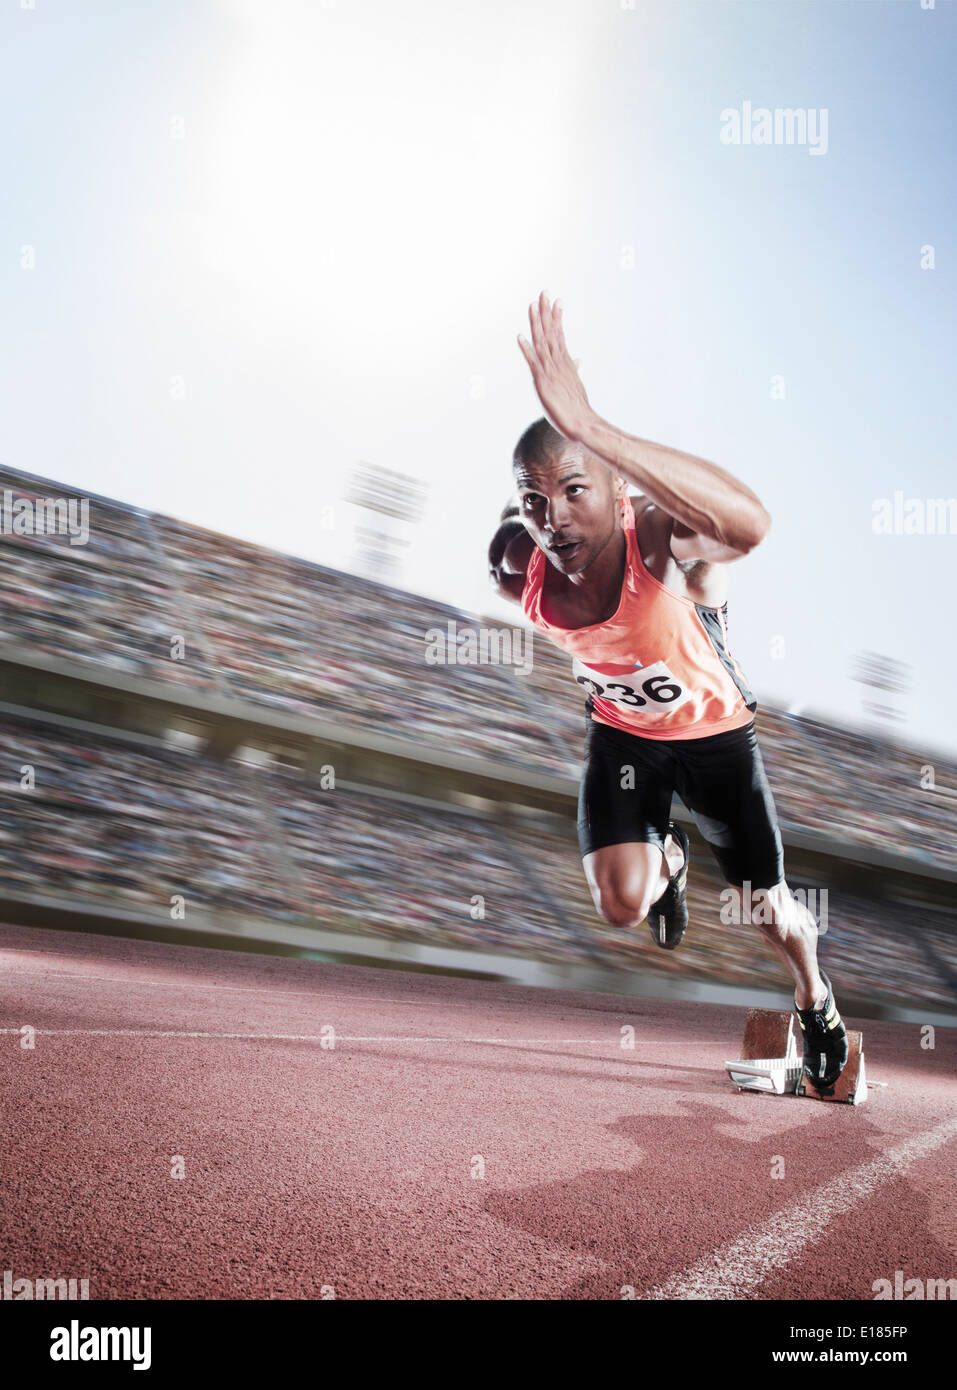 Sprinter vom Startblock Stockfoto